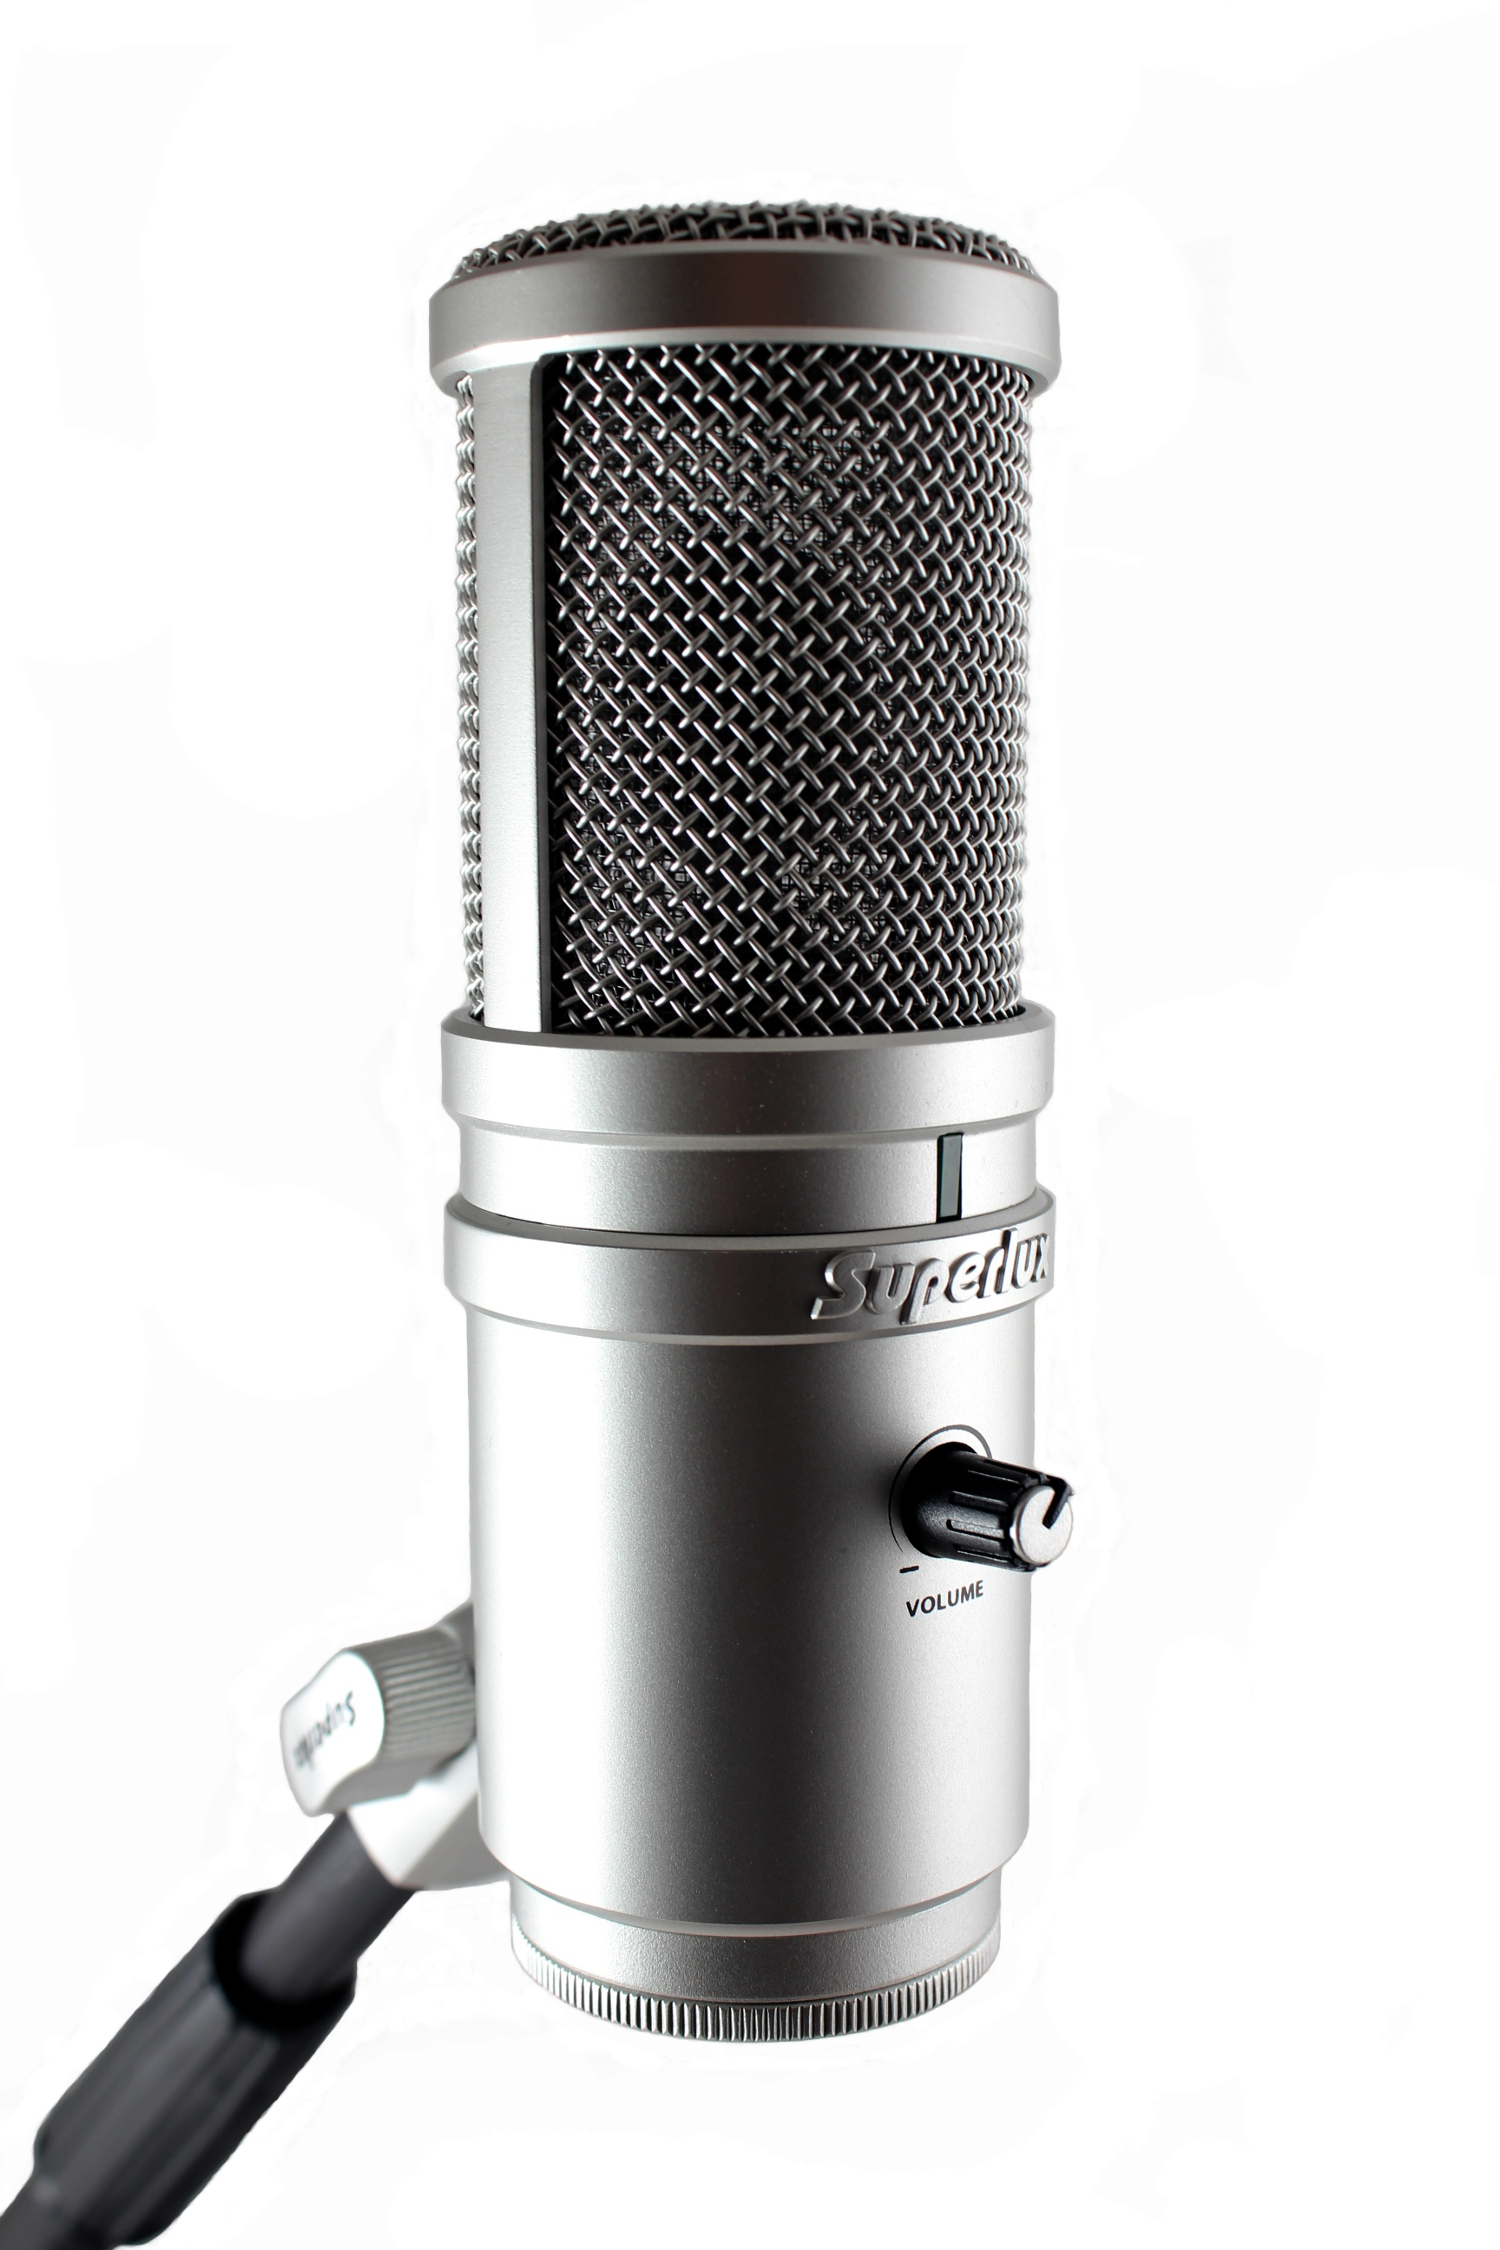 superlux e205u usb studio condenser microphone 4710423844797 ebay. Black Bedroom Furniture Sets. Home Design Ideas